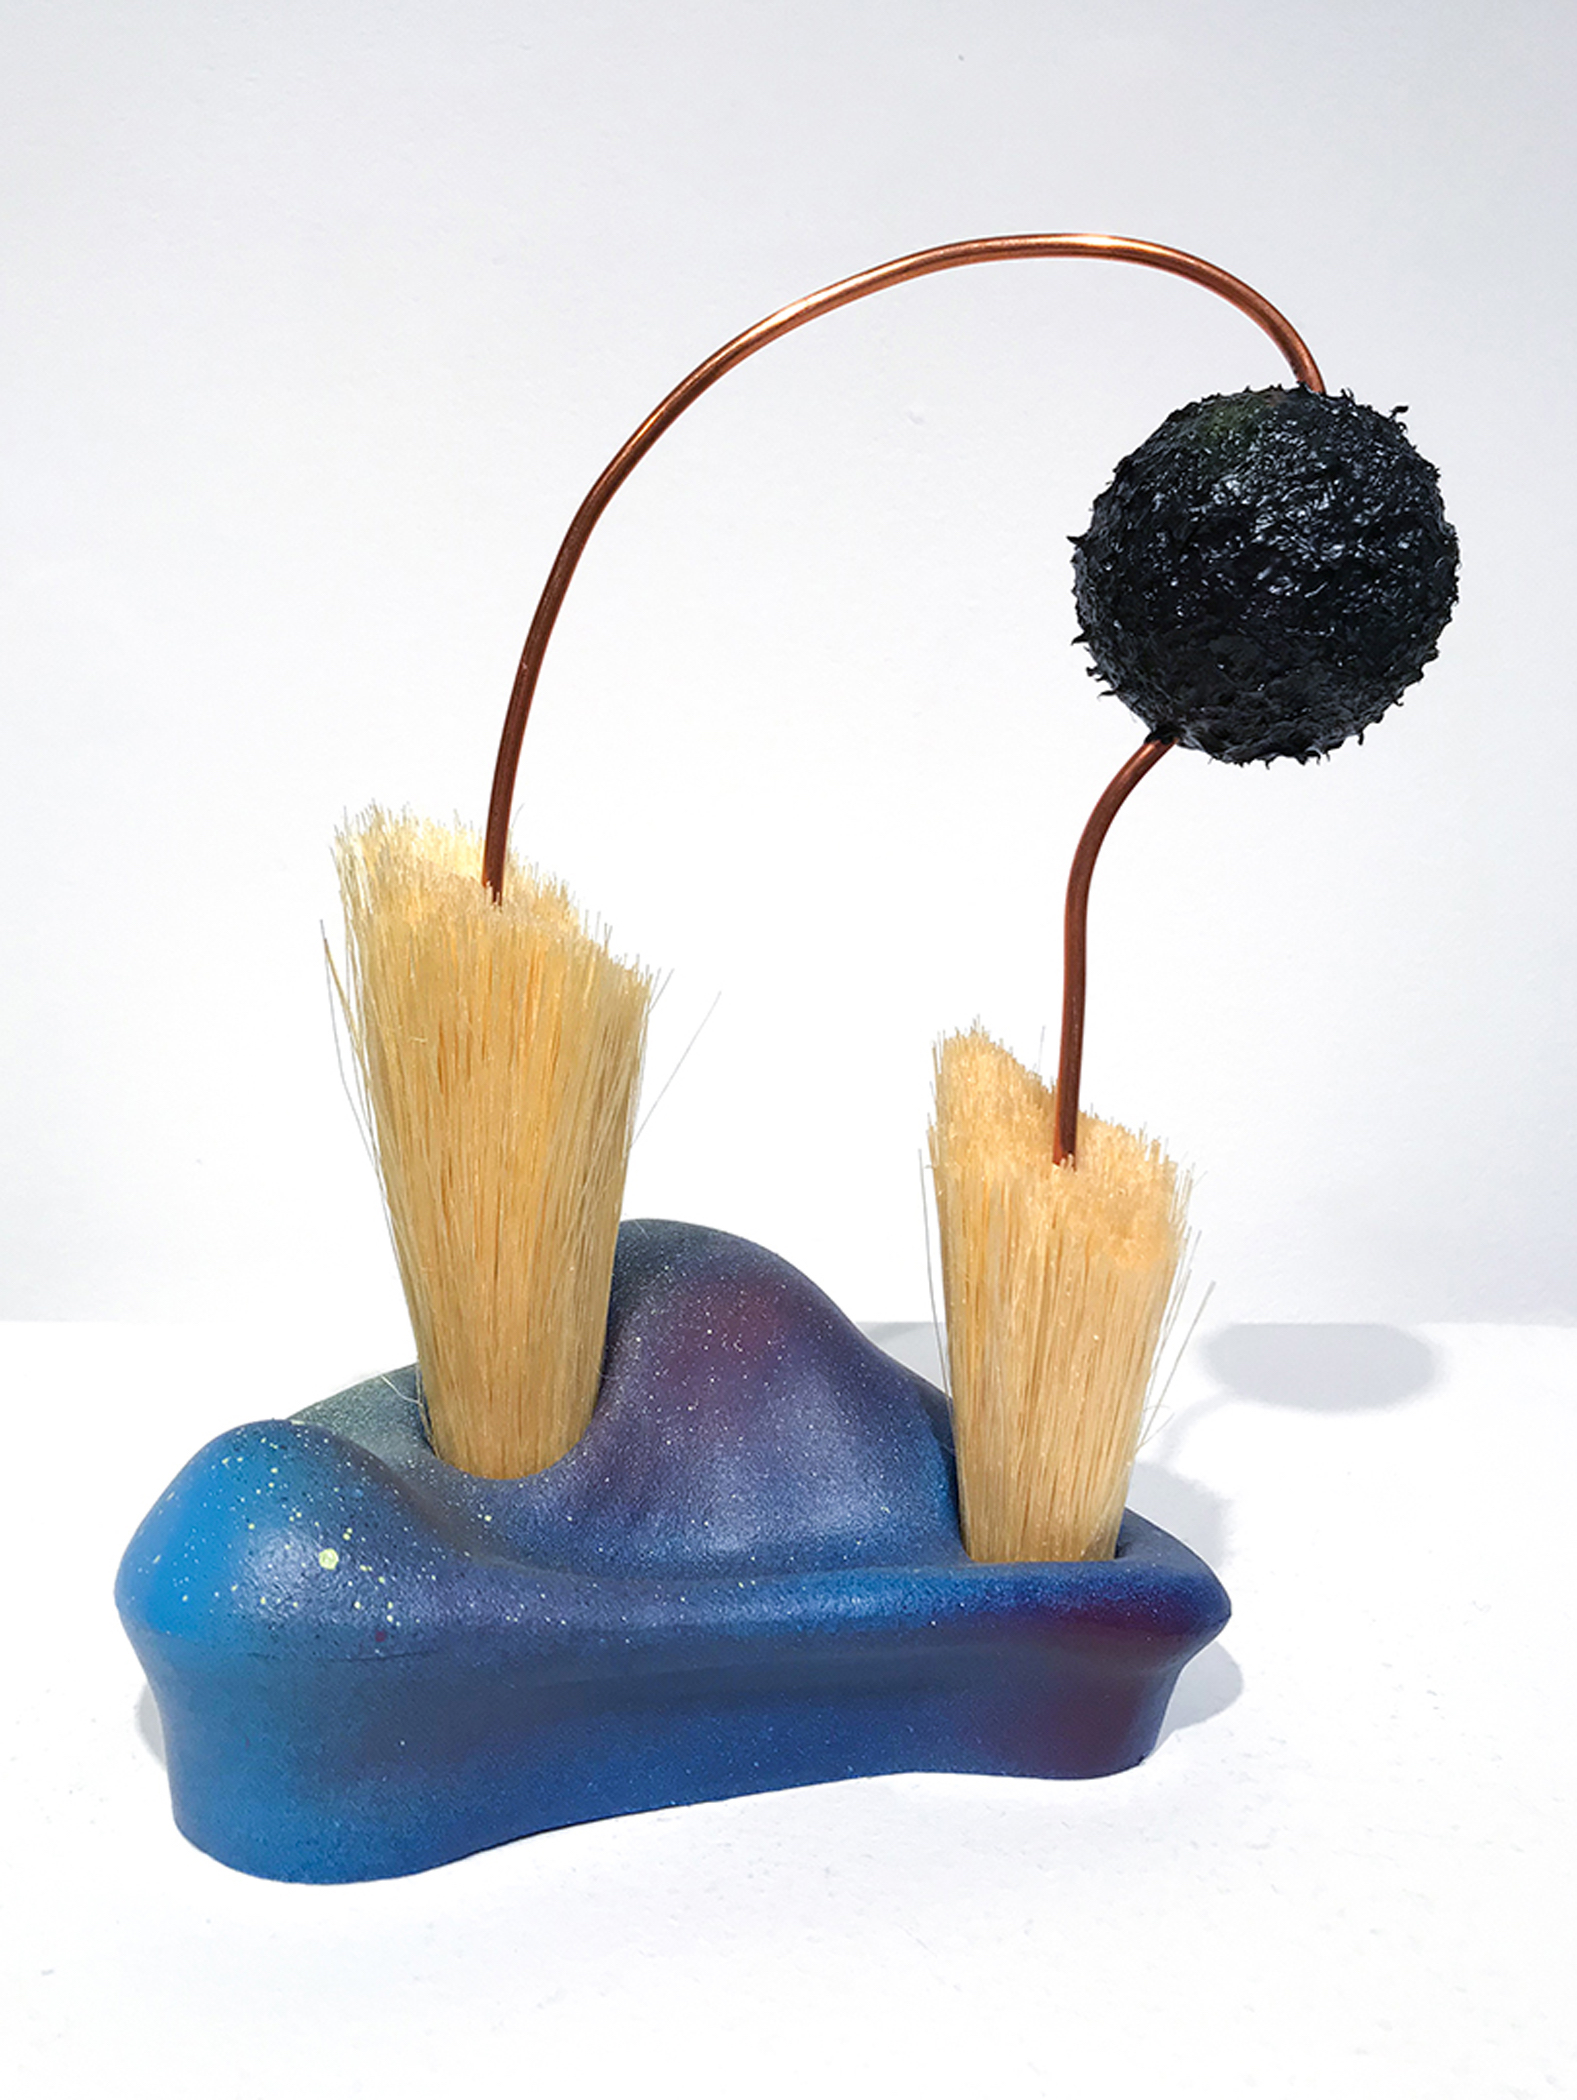 Kolman & Pryor Gallery_Kate Casanova_Untitled 27_2019_climbing hold, broom fibers, copper wire, foam, and acrylic and spray paint_8.5 x 7 x 4 inches_�375.jpg